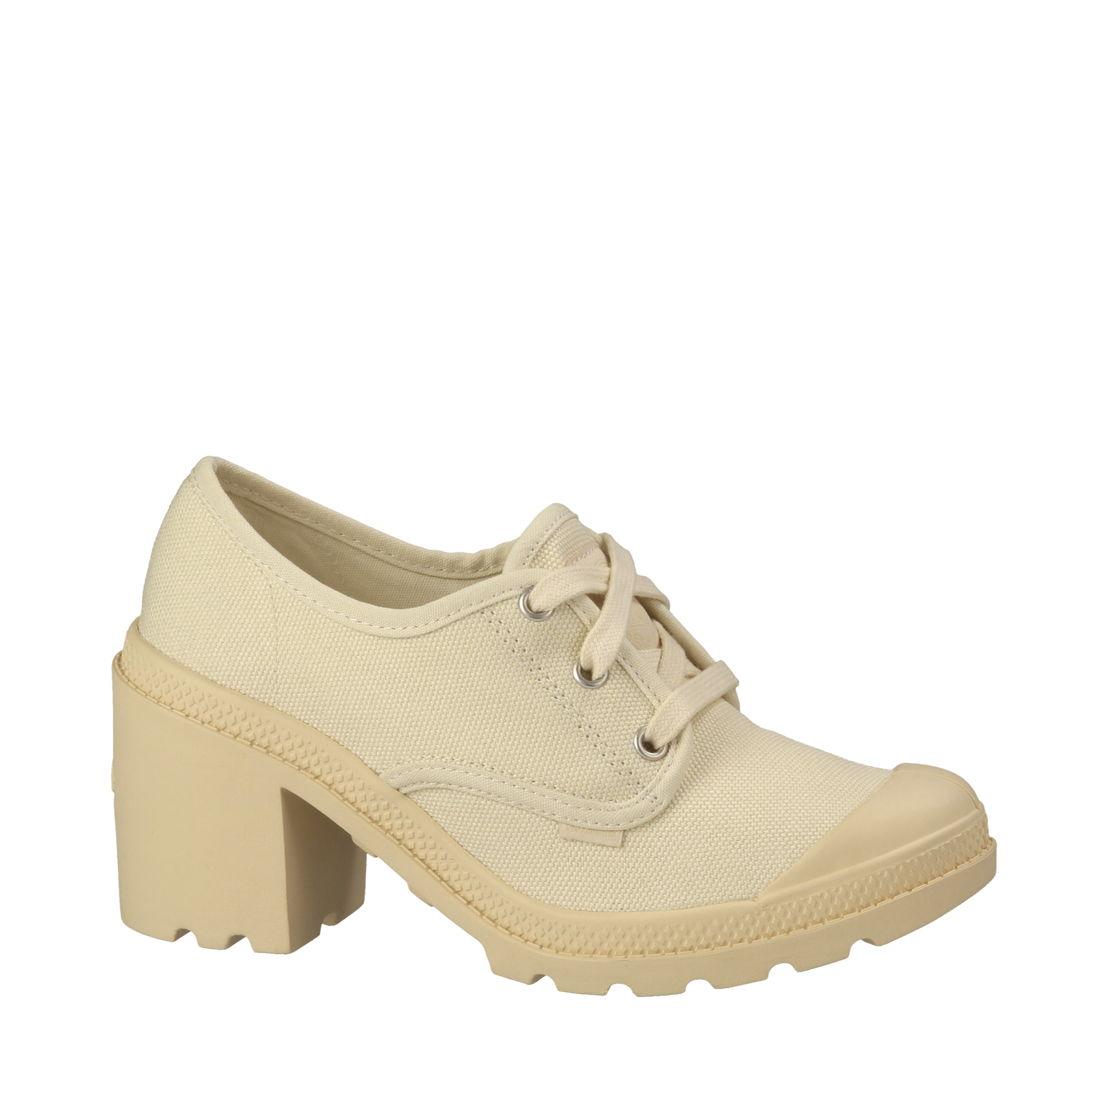 Palladium_Women Pampa Oxford Heel - 69,95 euro